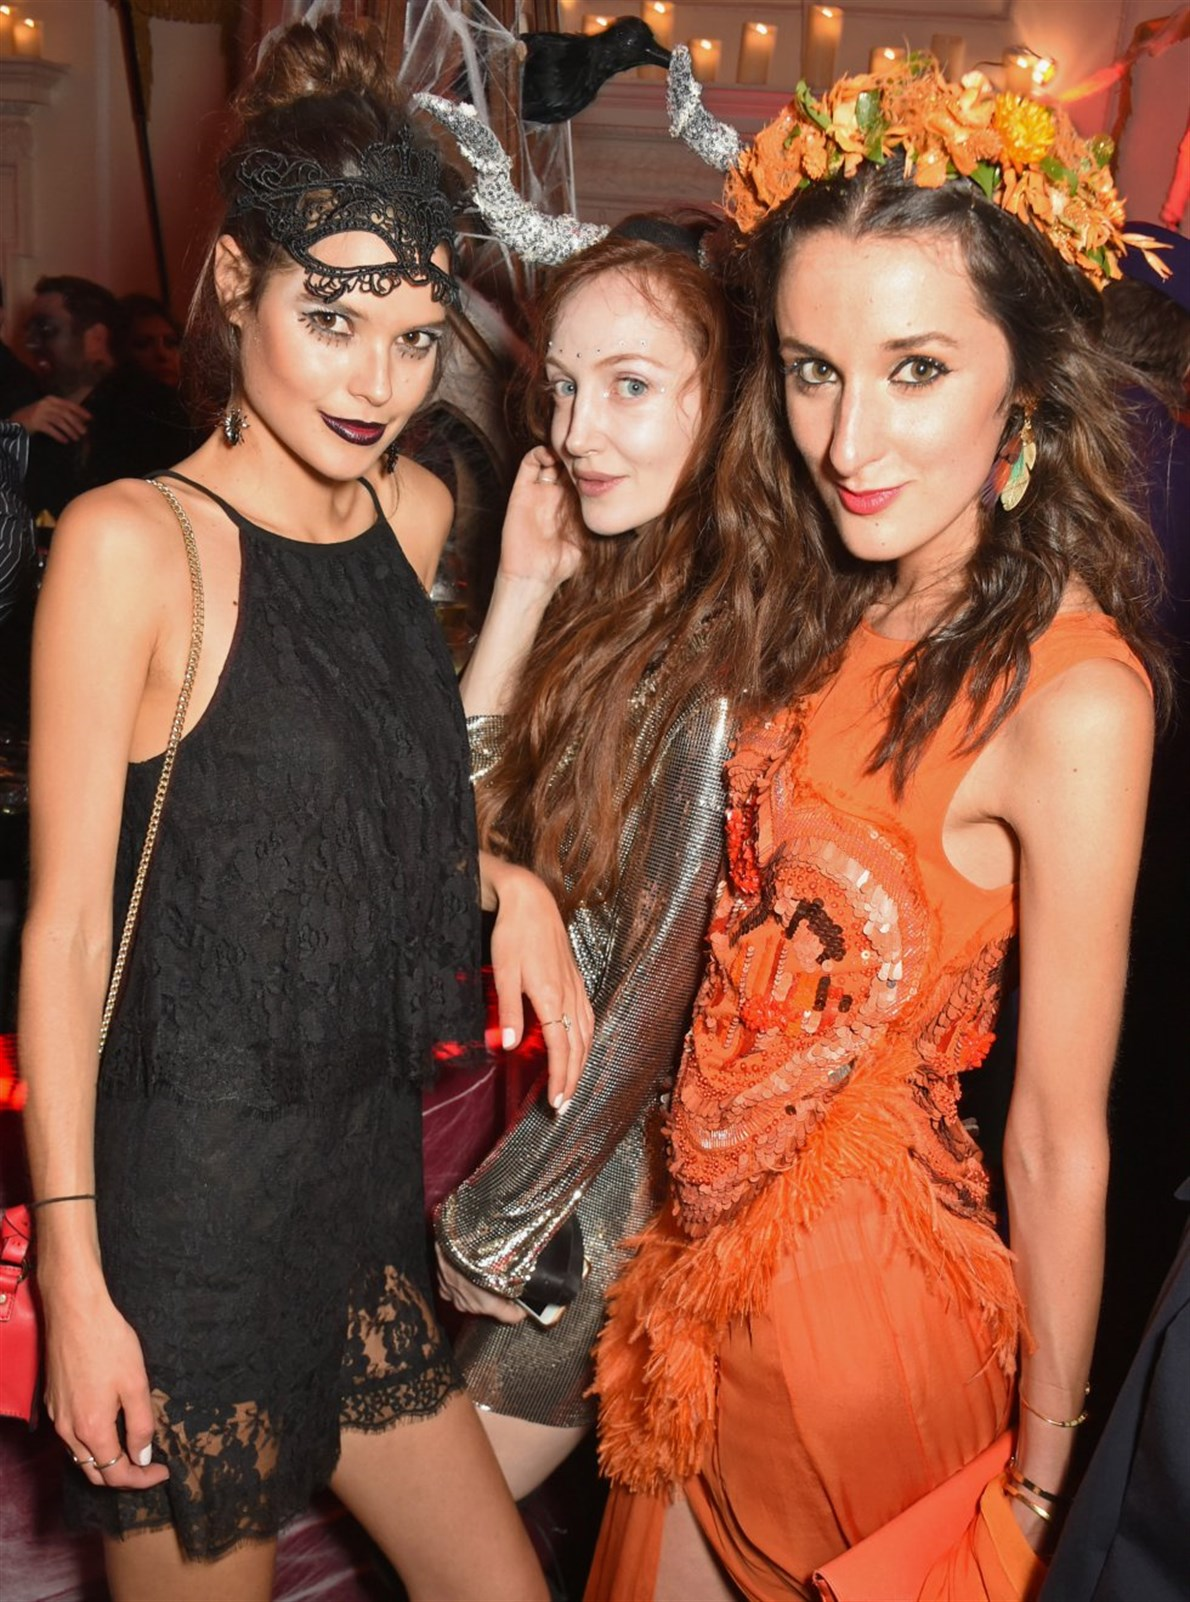 Sarah Ann Macklin, Olivia Grant y Rosanna Falconer, en la noche de Halloween en Londres.